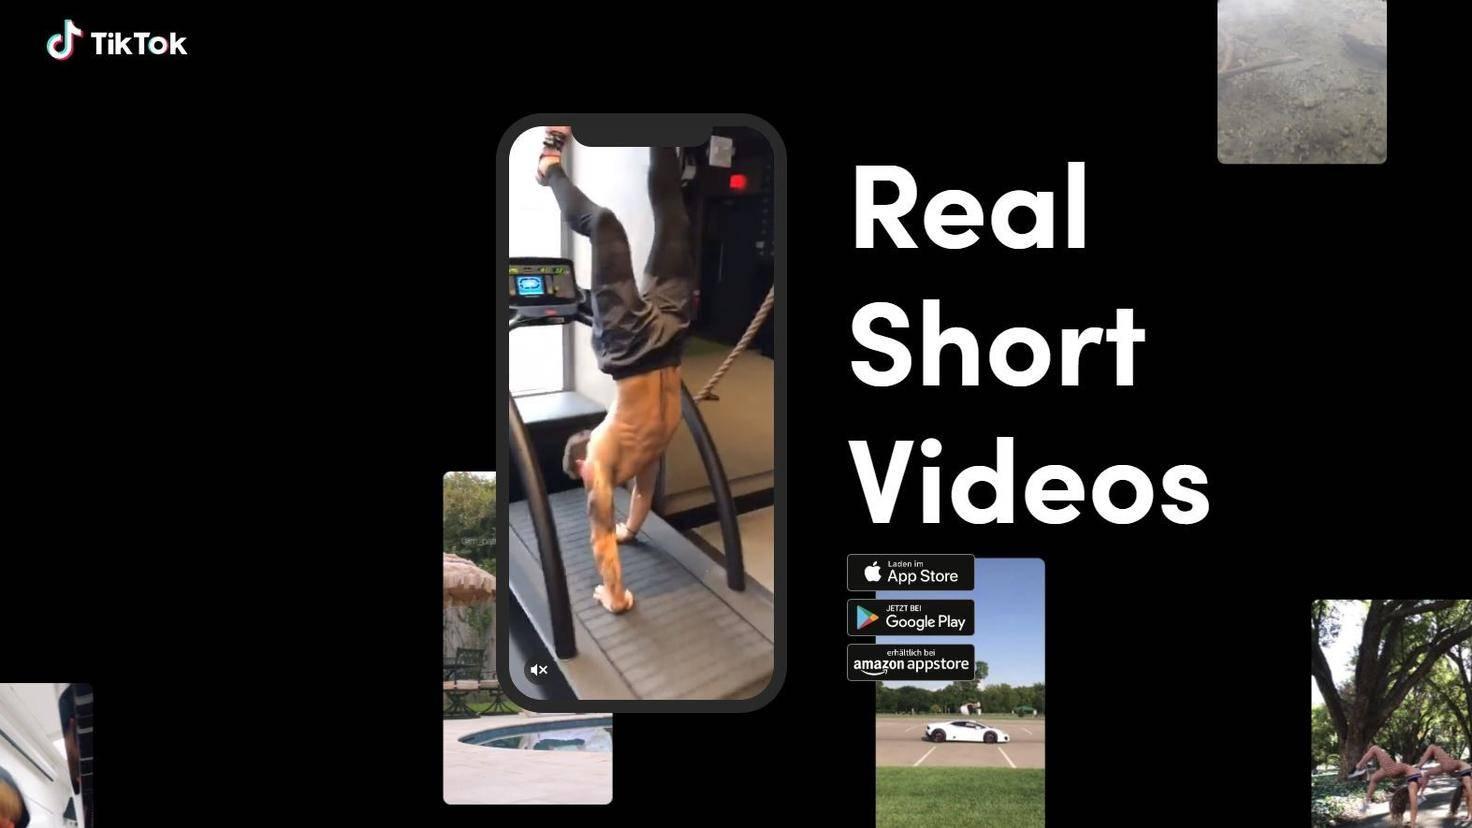 tiktok-screenshot